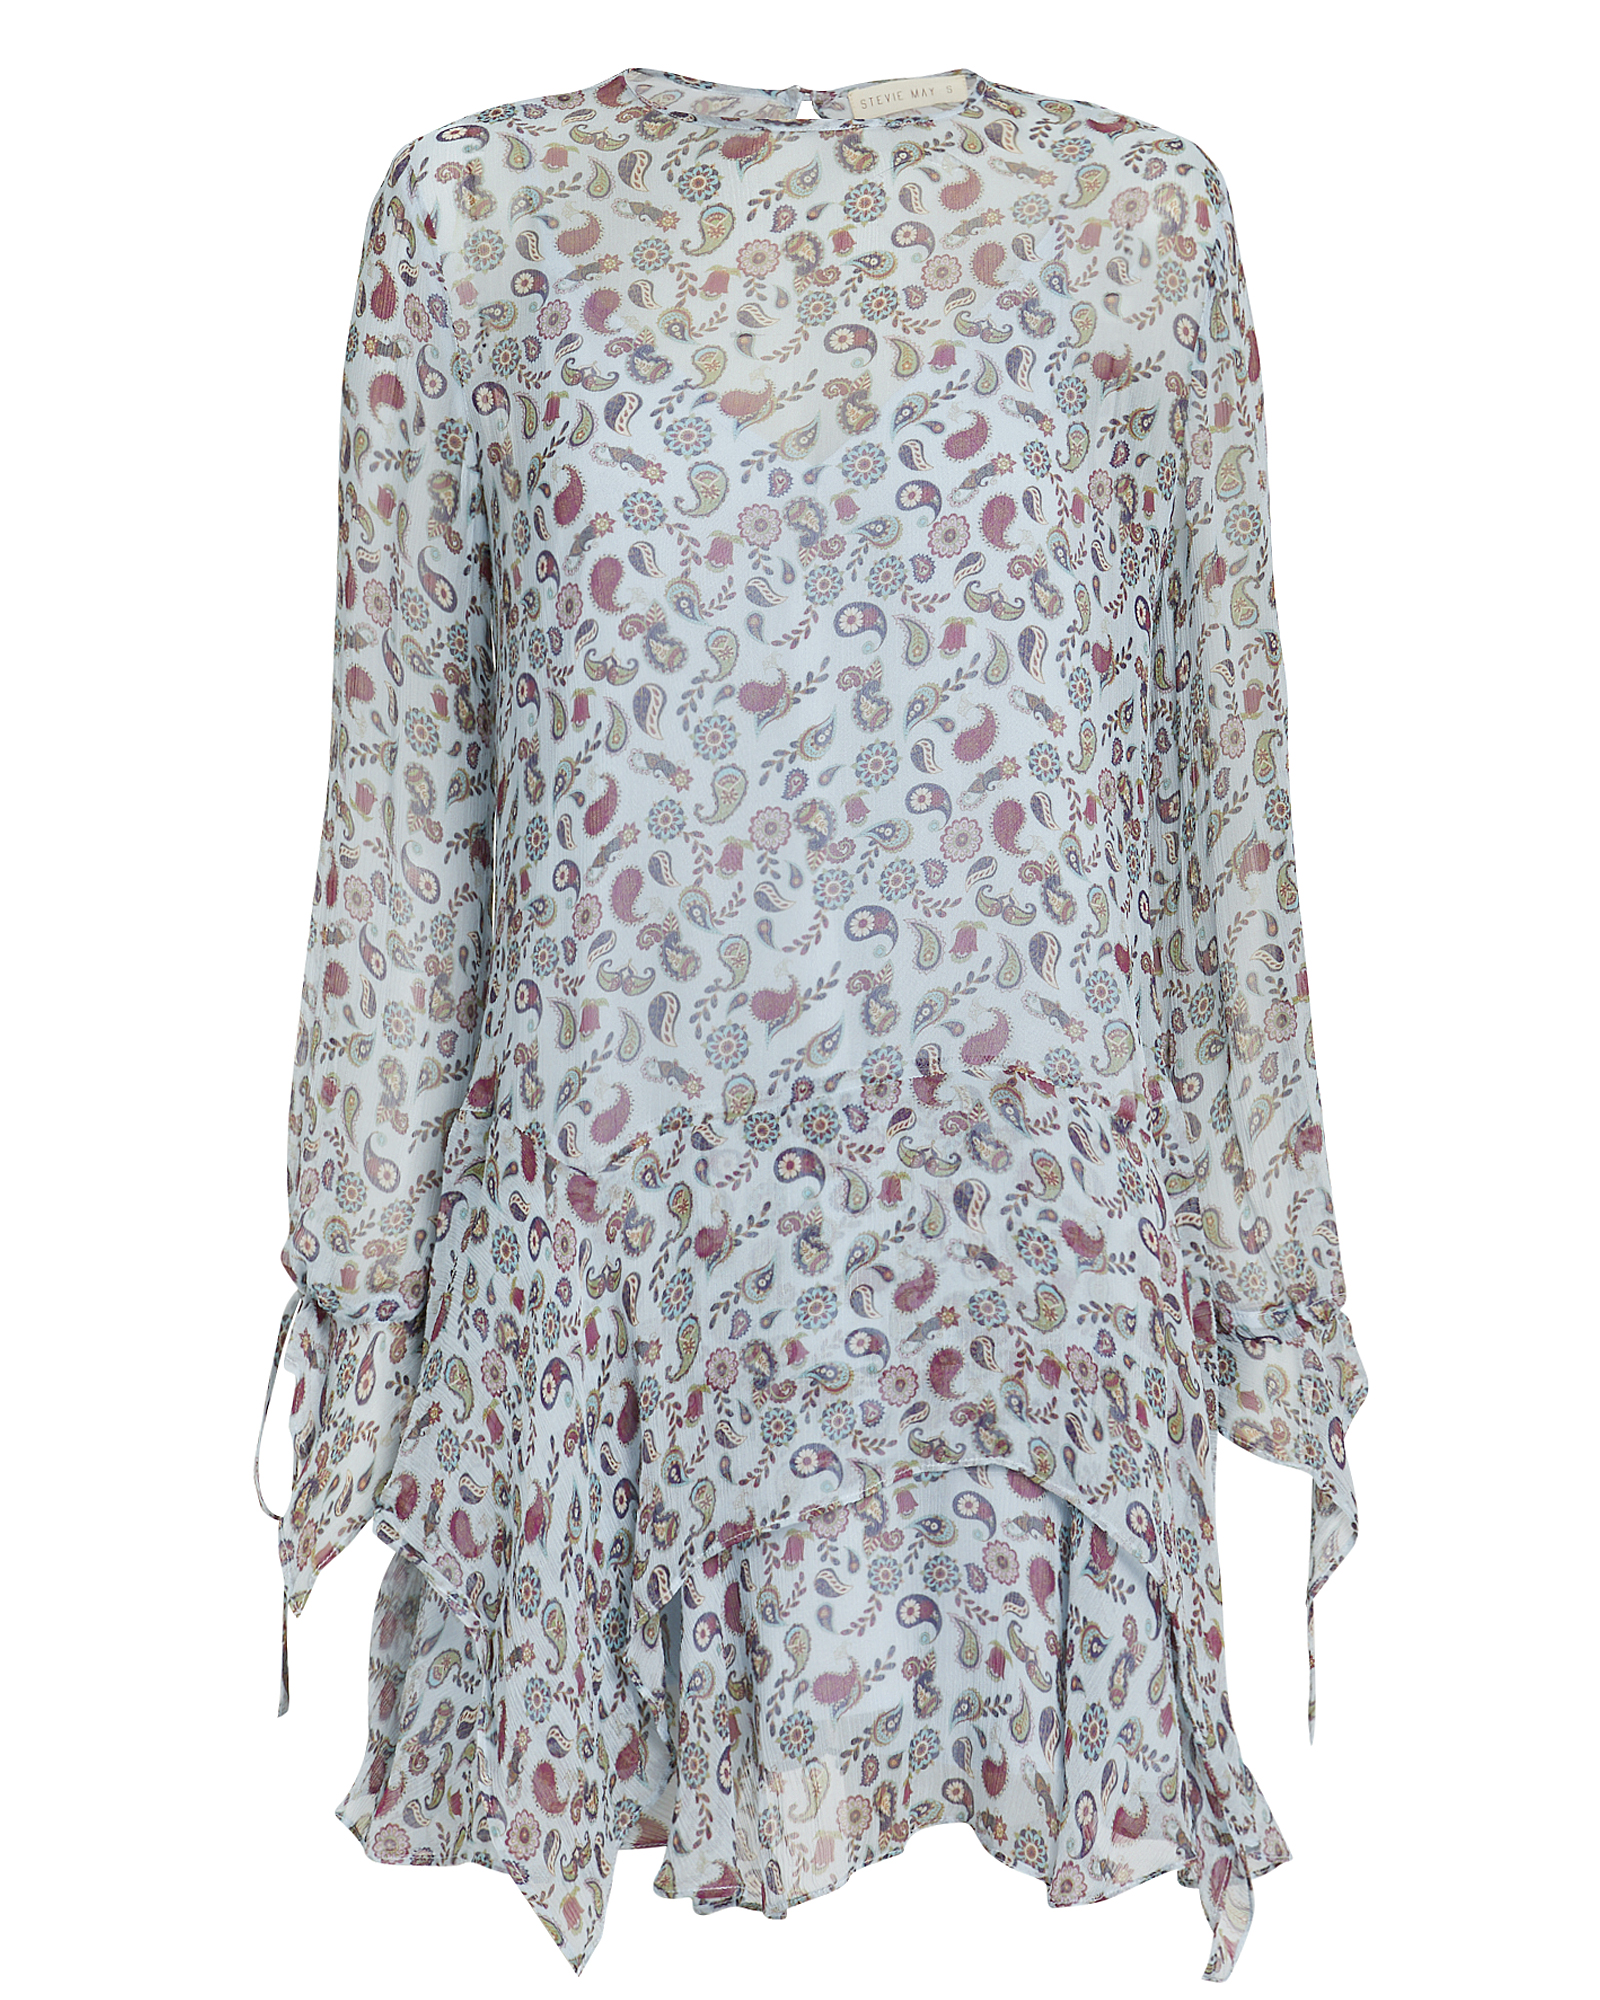 Stevie May Dresses STEVIE MAY DELILAH MINI DRESS  BLUE/PAISLEY M